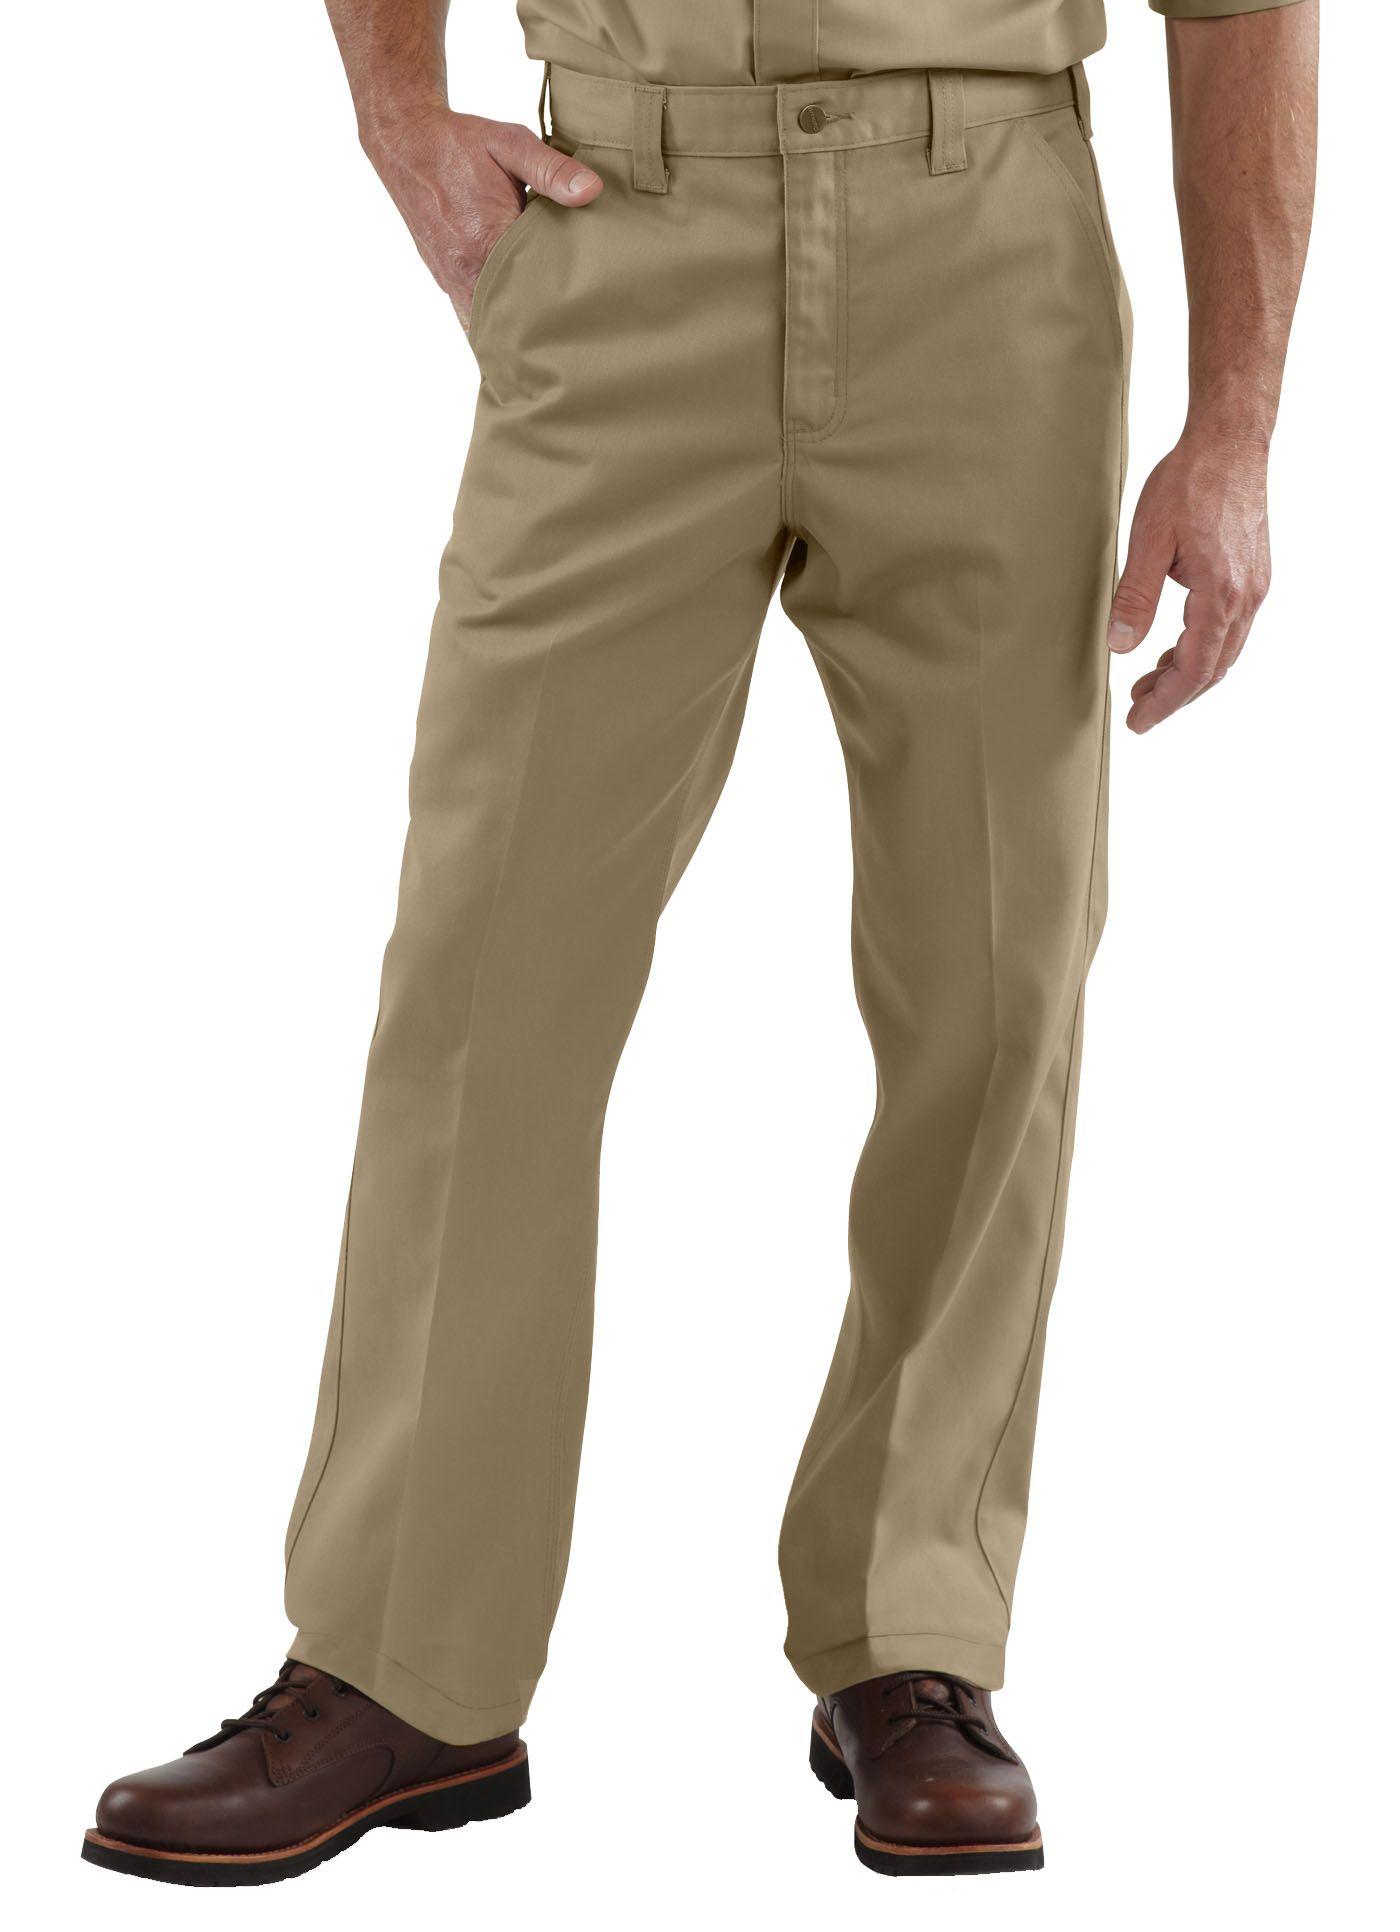 Carhartt Men's Twill Work Pants - Big